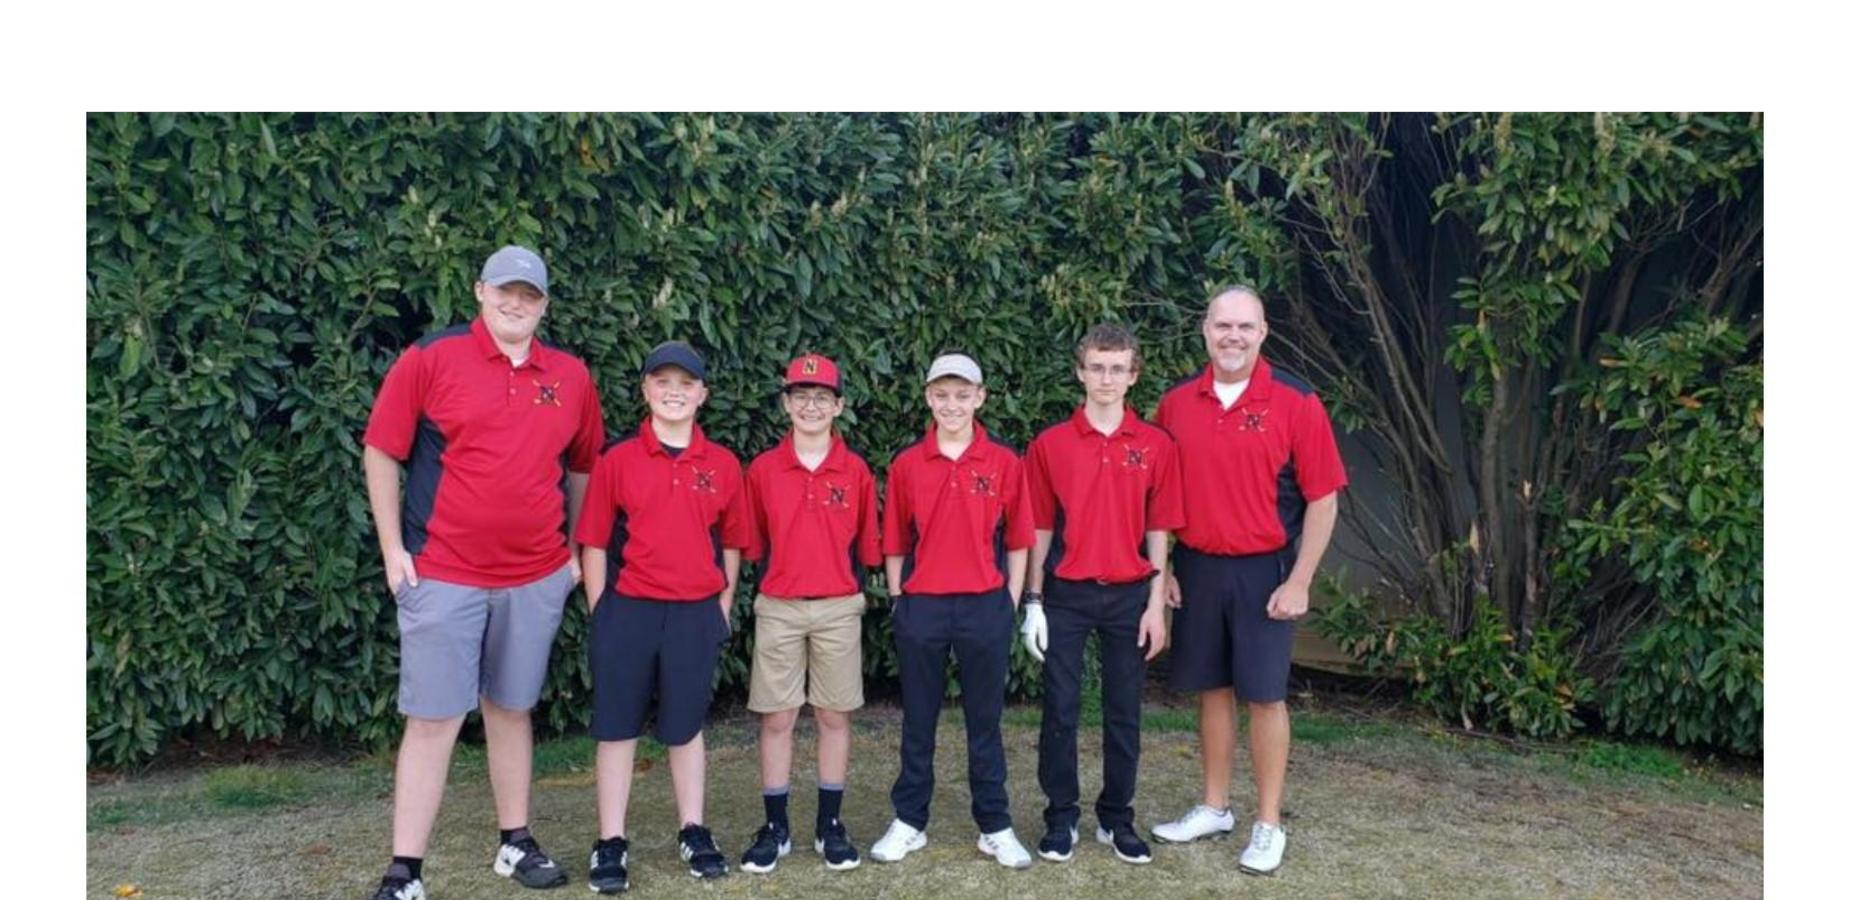 Photo of Nolachuckey golf team.